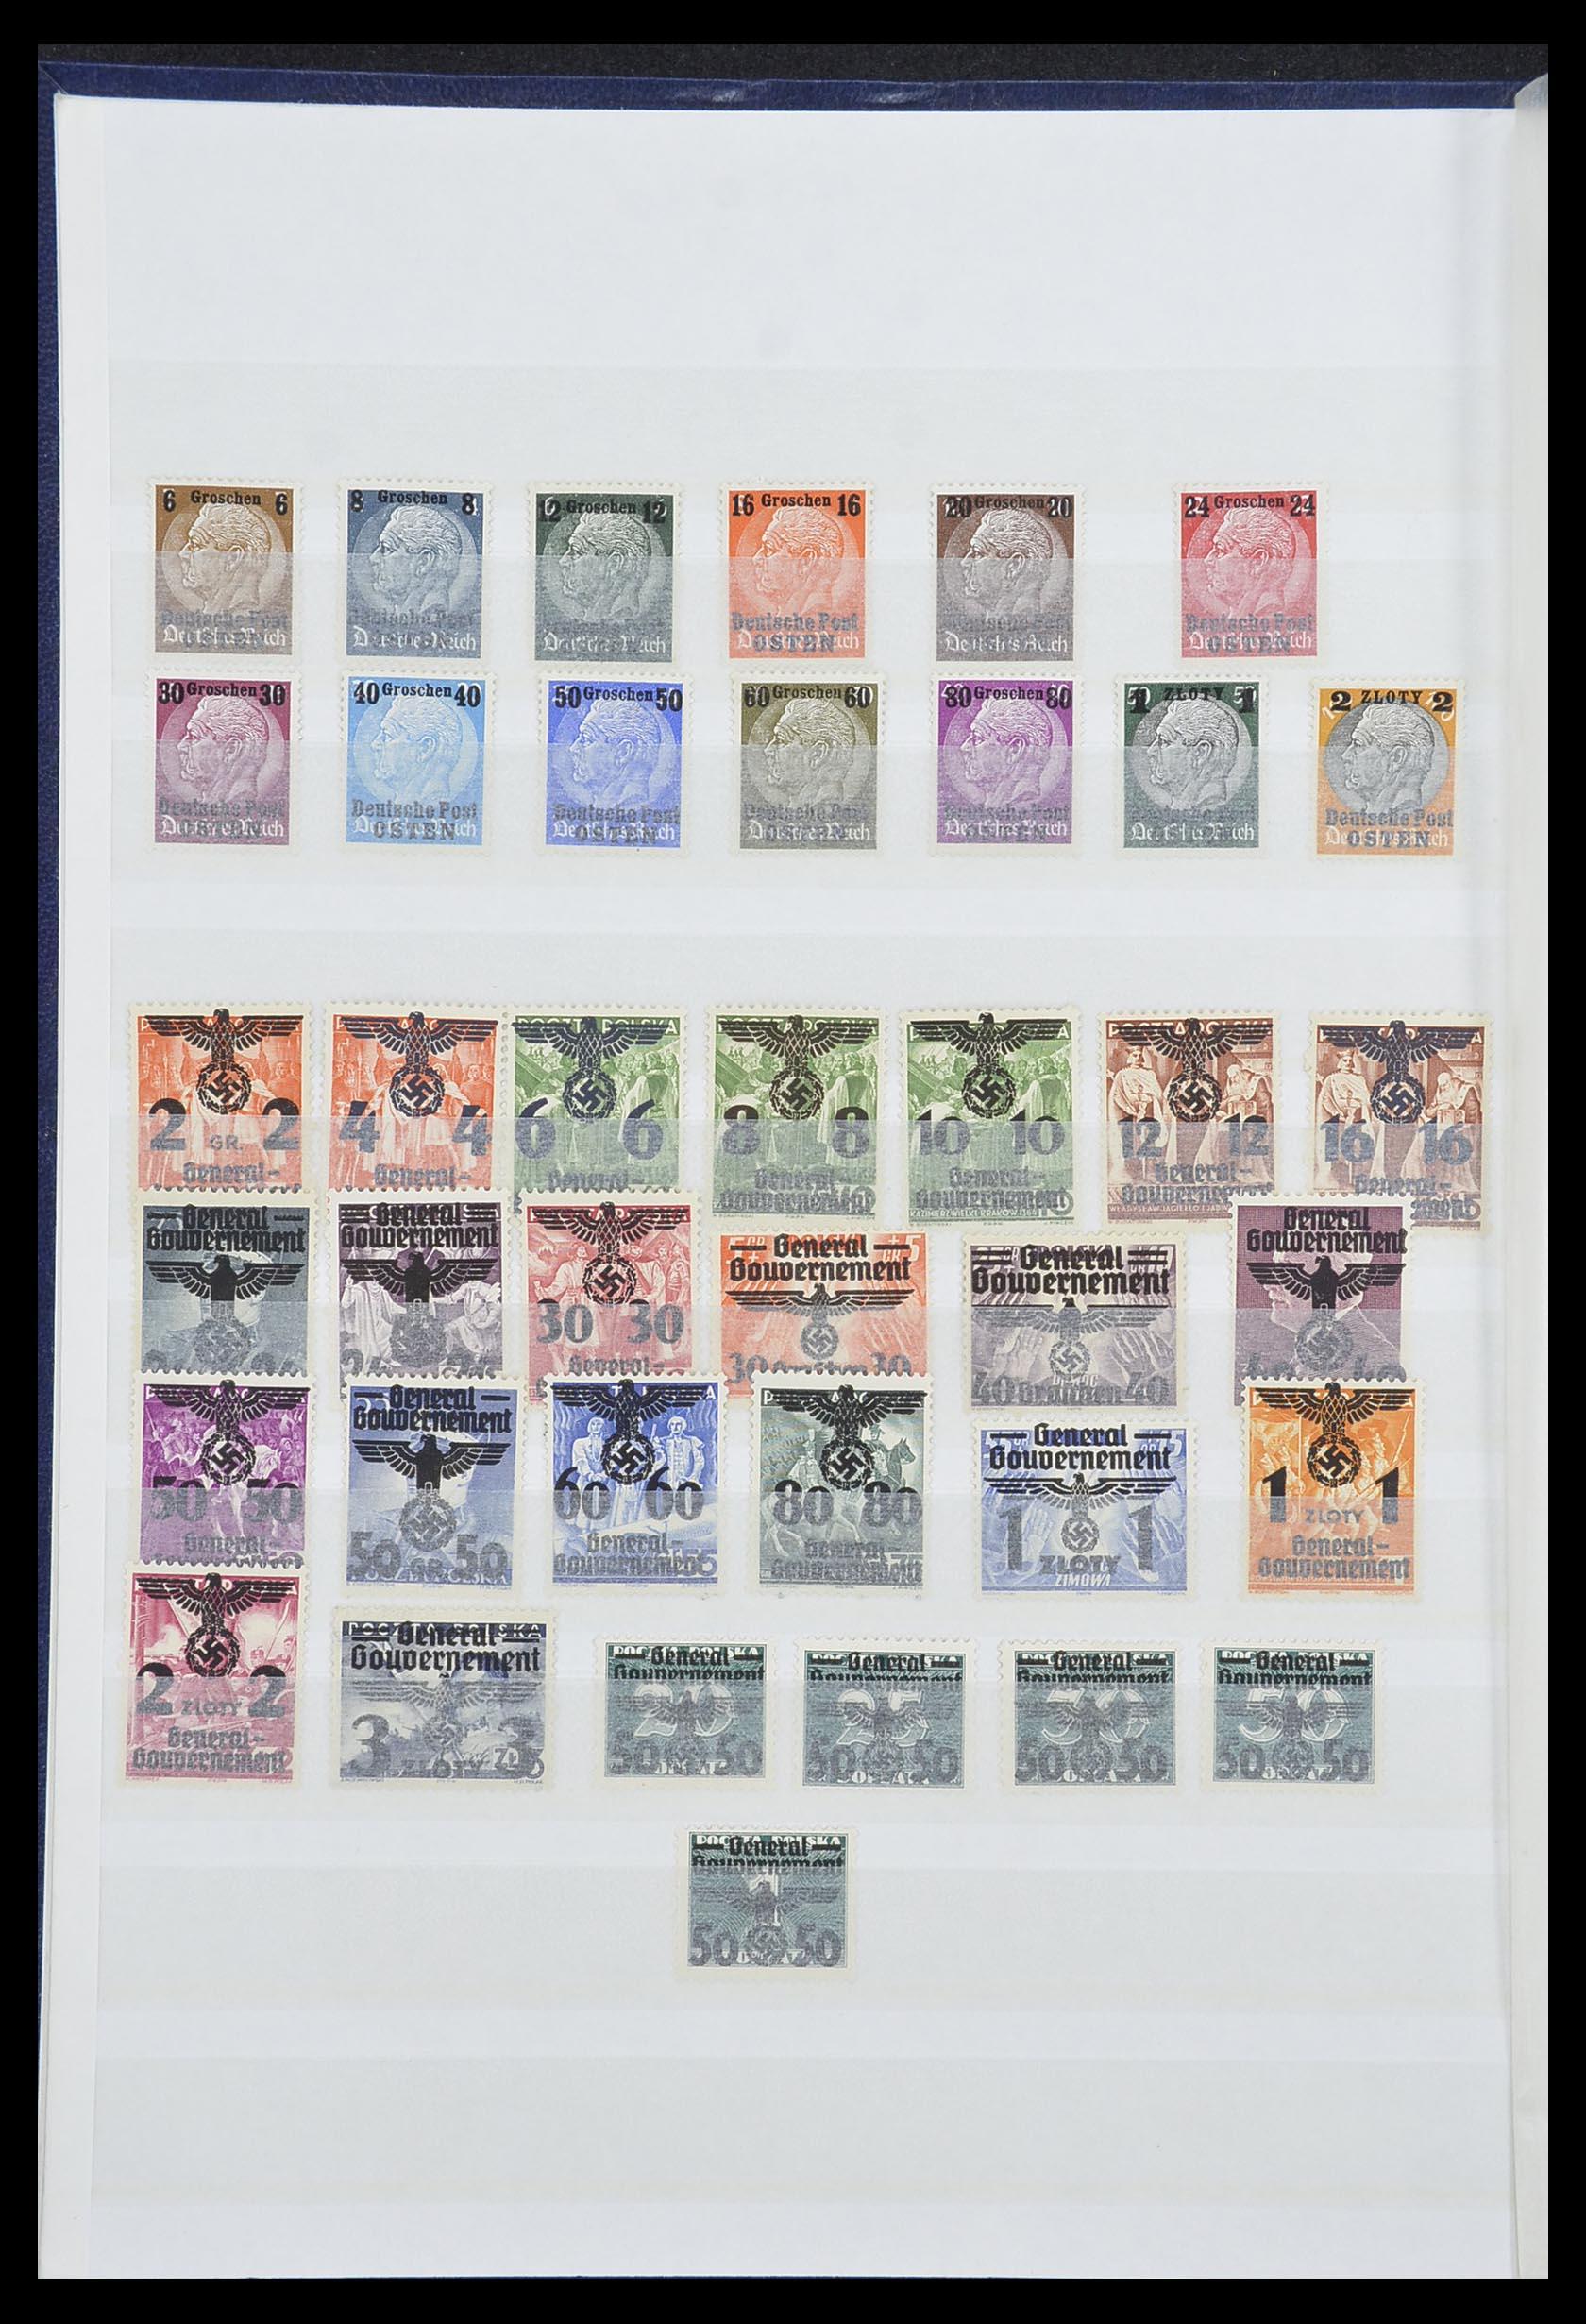 33850 001 - Postzegelverzameling 33850 Duitse bezettingen 2e wereldoorlog 1939-19